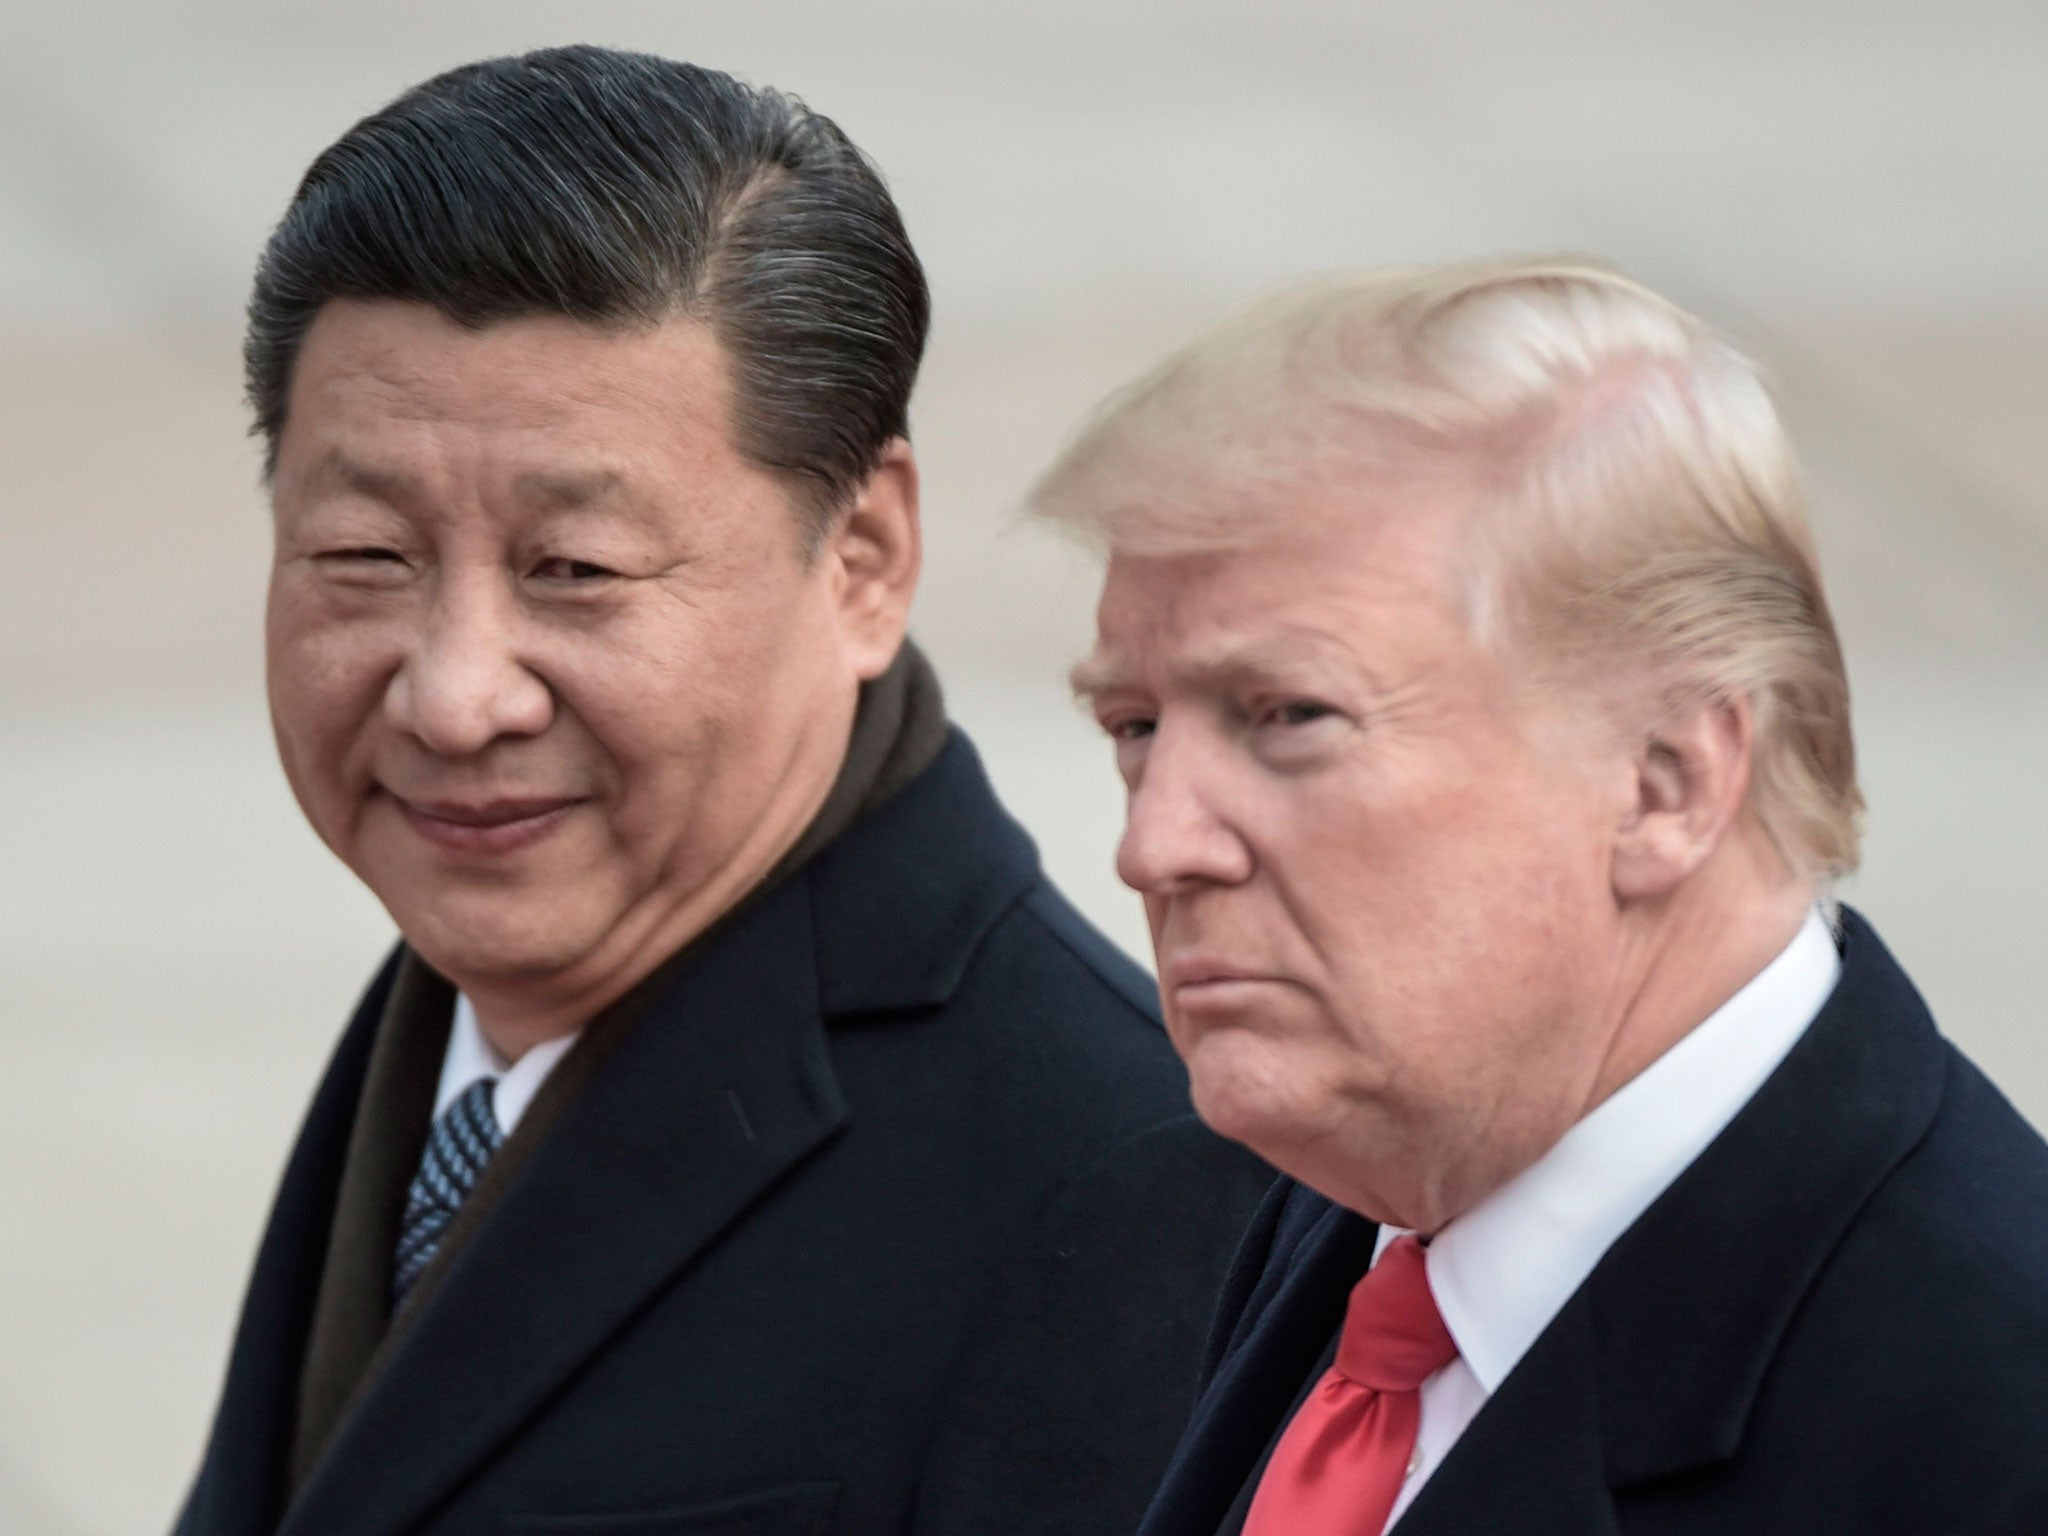 China says it must retaliate to Trump tariffs as experts say full-blown trade war 'now seems certain'